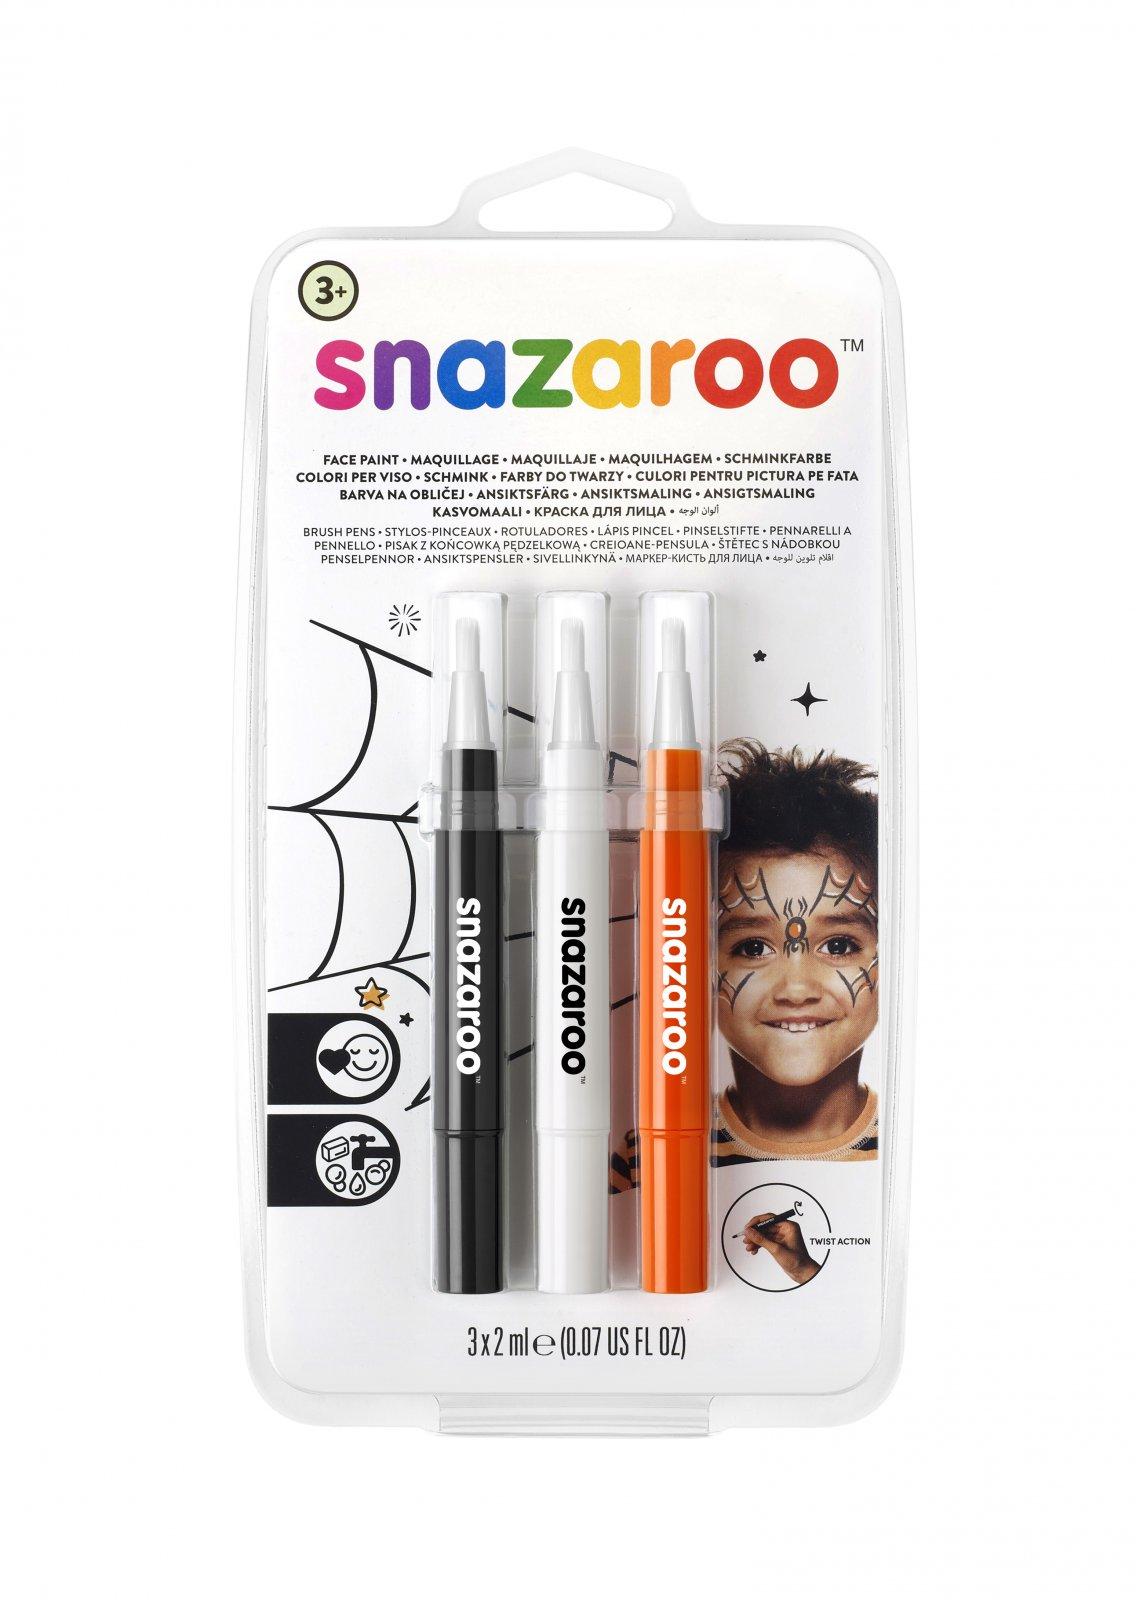 Snazaroo Face Painting Brush Pens